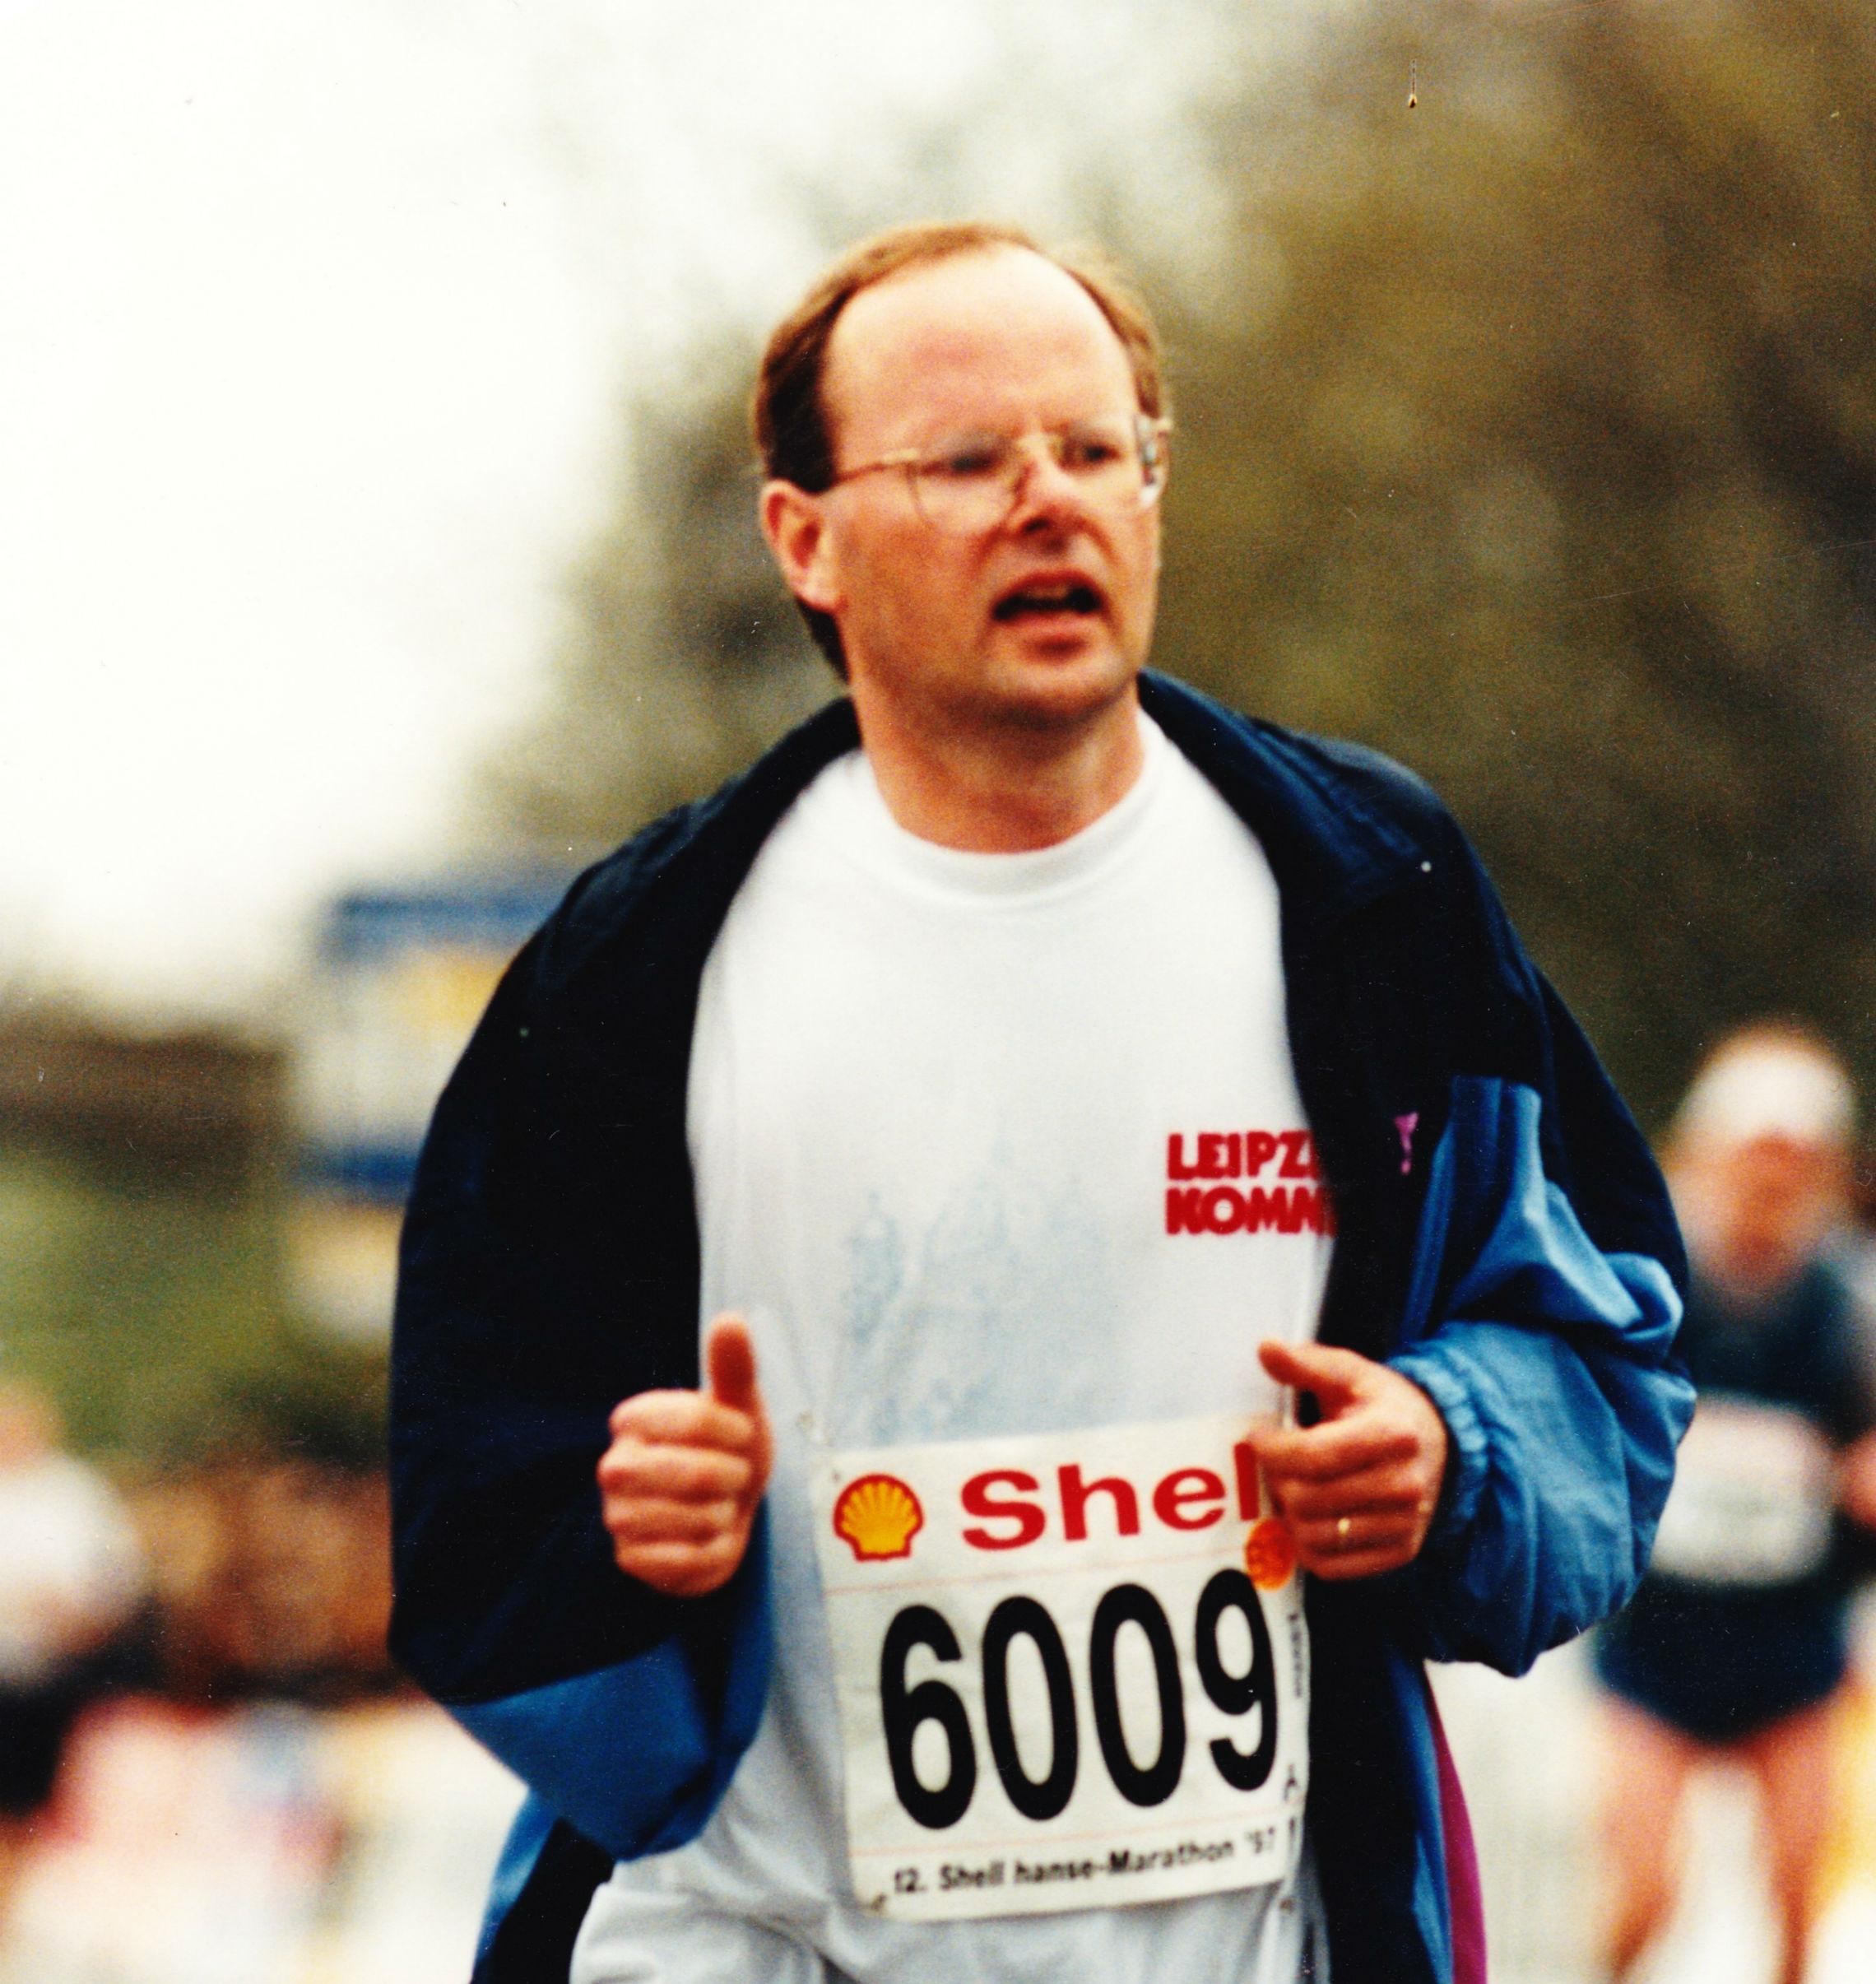 1997 My first marathon in Hamburg, Germany